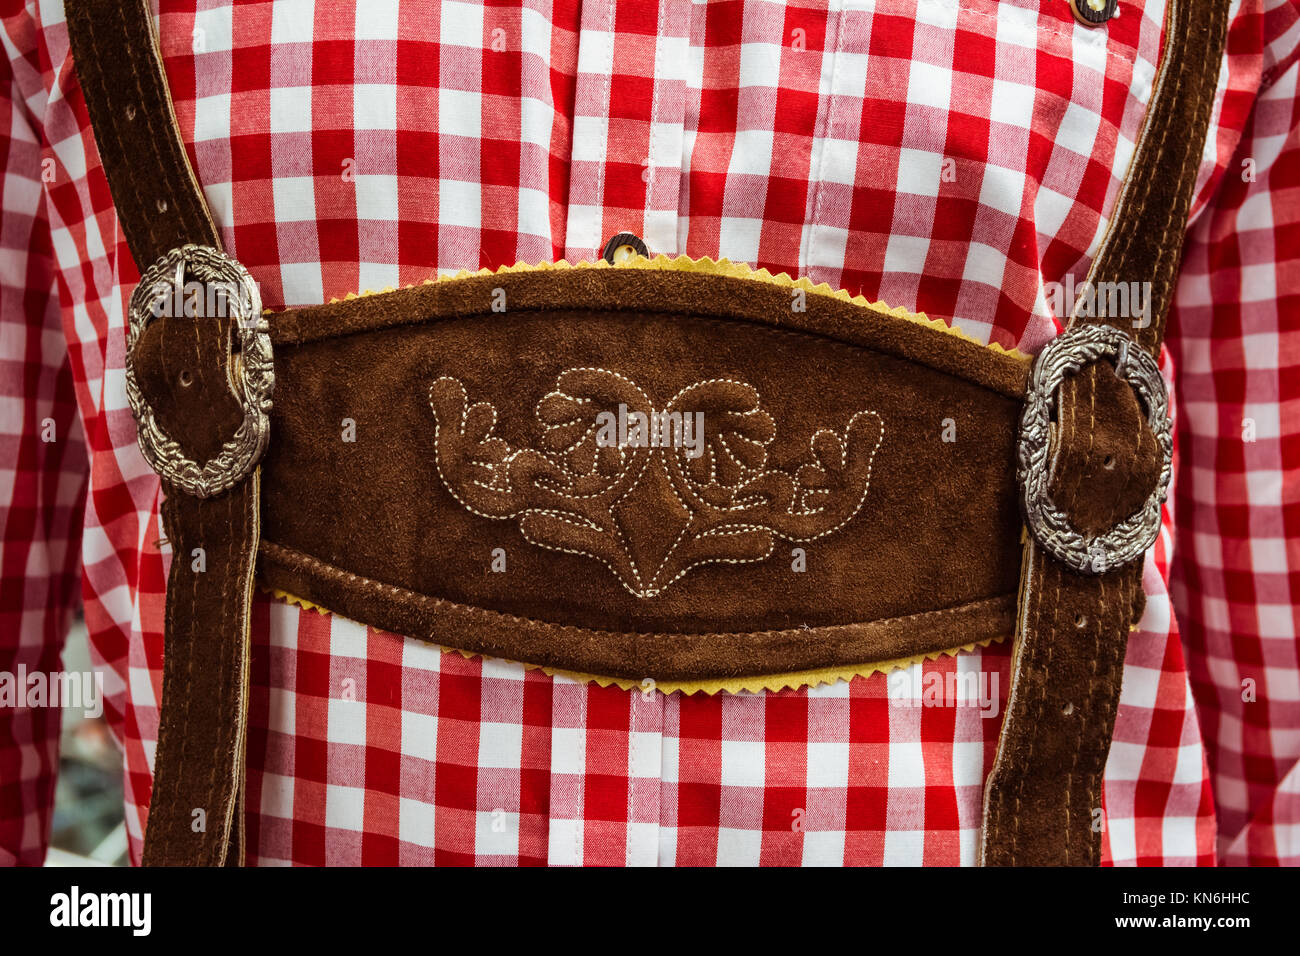 Traditional German Lederhosen Center Chestpiece Closeup Leather Plaid Dress Red White - Stock Image